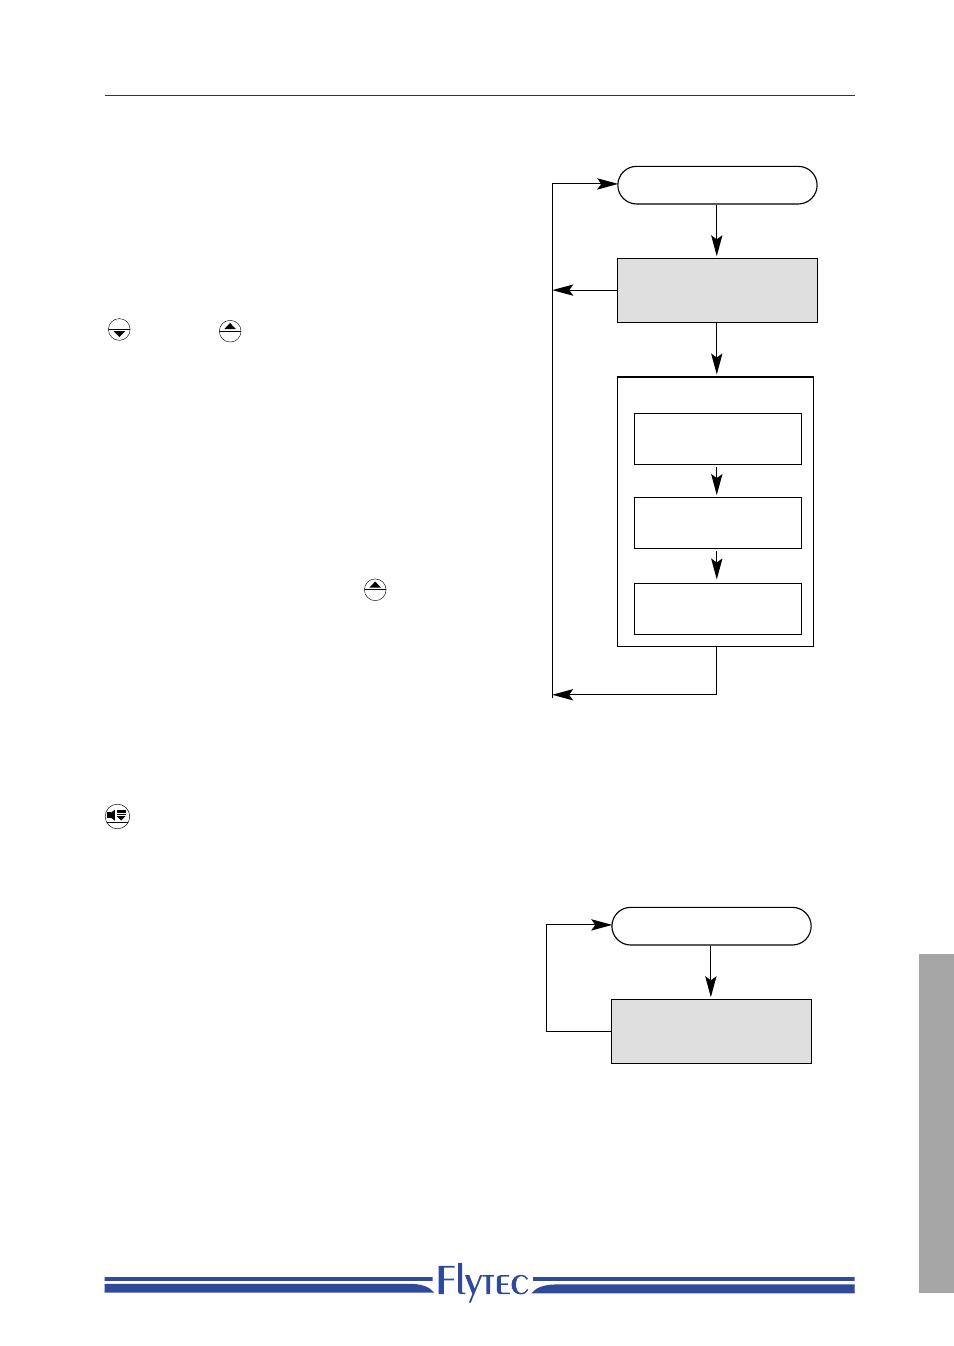 flytec 4005 manual